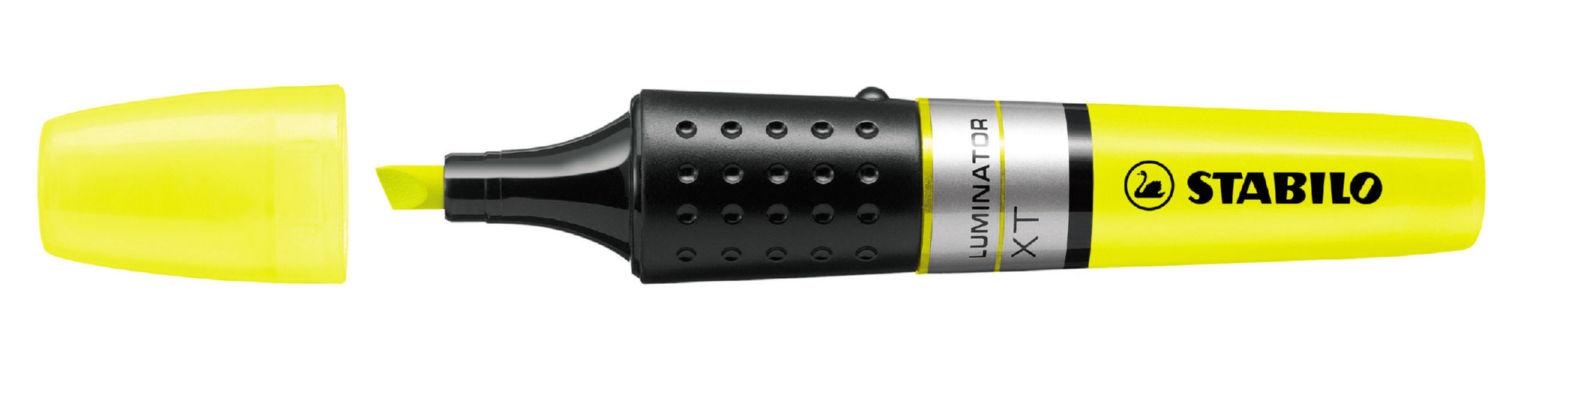 Highlighters Stabilo Boss Luminator Highlighter Double Cap Yellow PK5